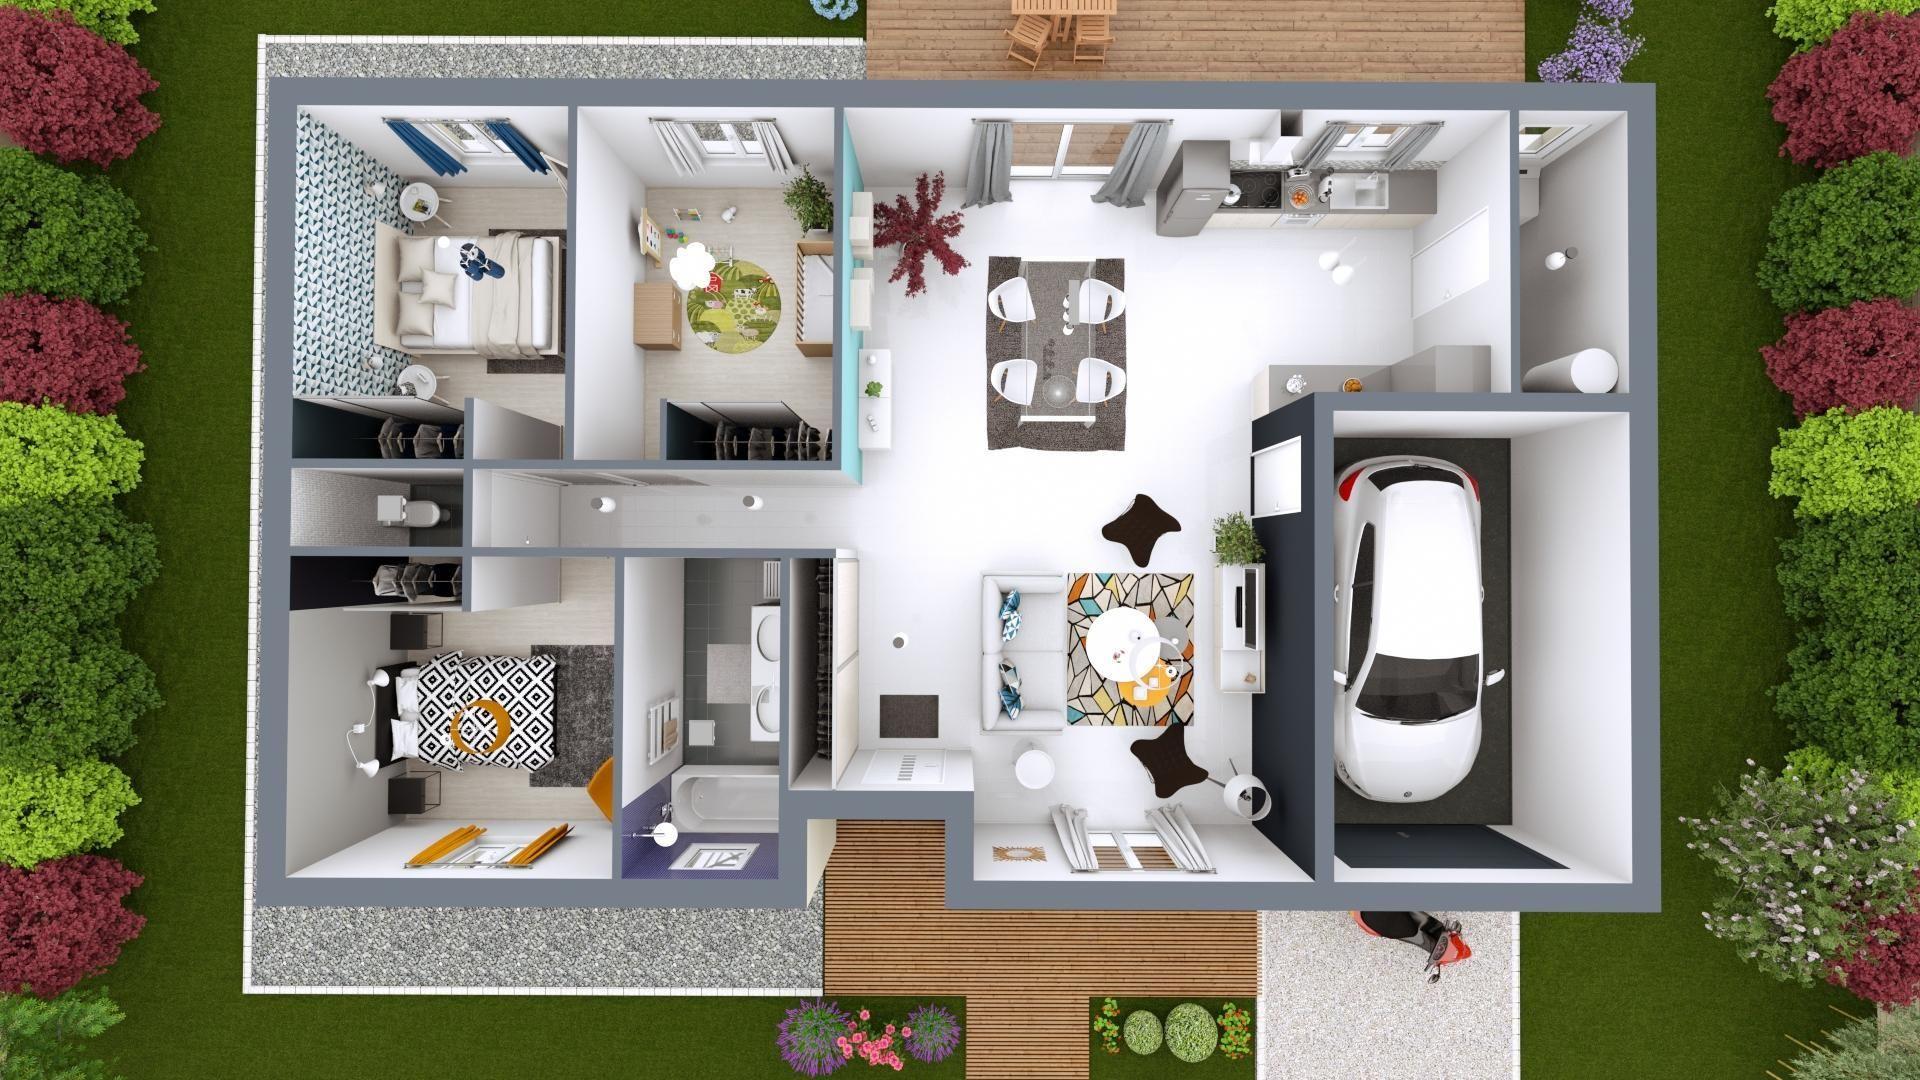 Modele De Maison Jeune Budget Maison Mca Budget Maison Plan